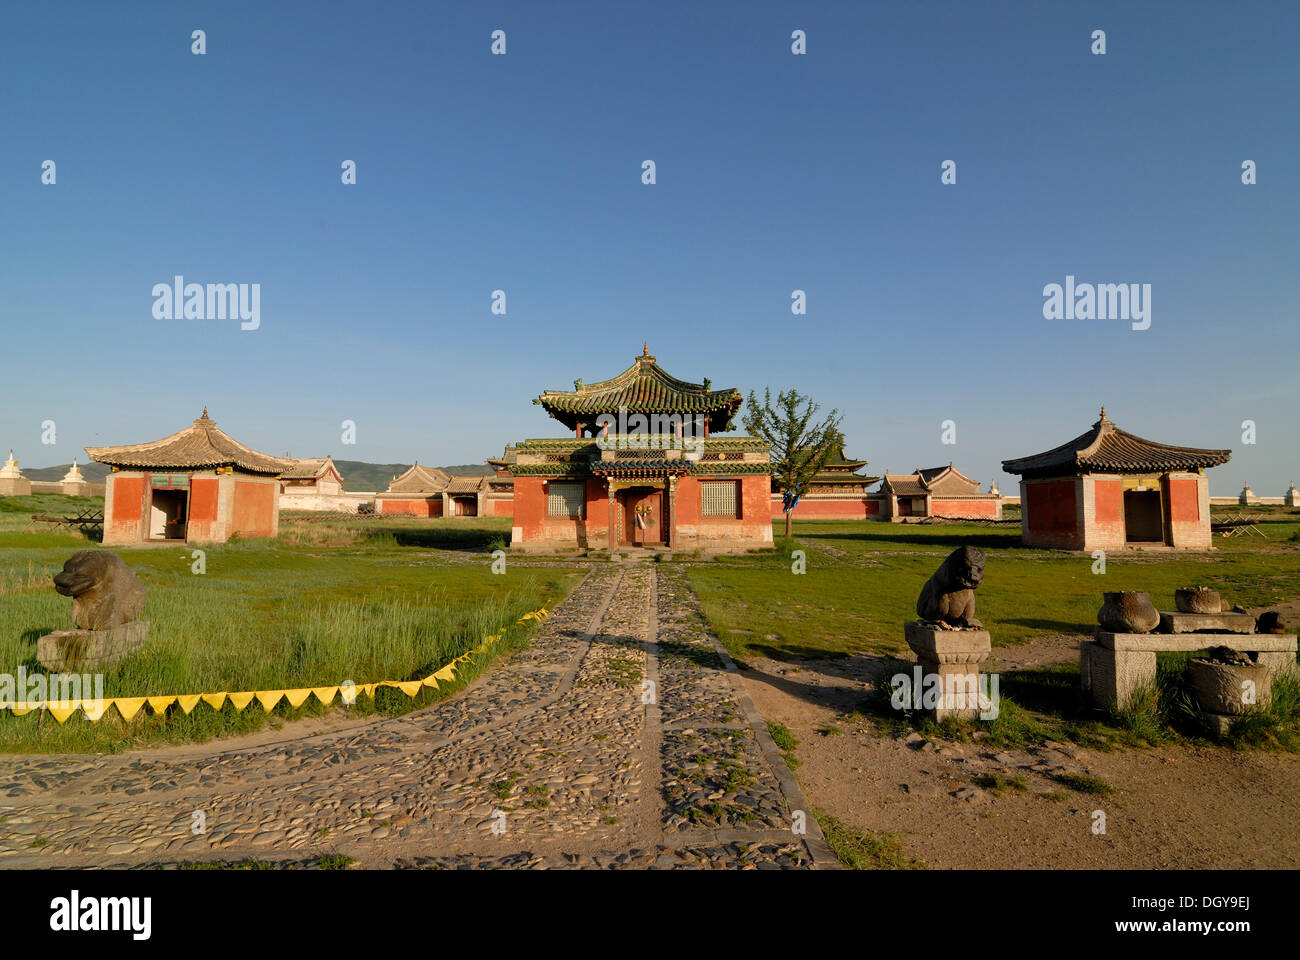 Temples inside the Erdene Zuu Khiid Monastery, Karakorum, Kharkhorin, Oevoerkhangai province, Mongolia, Asia - Stock Image